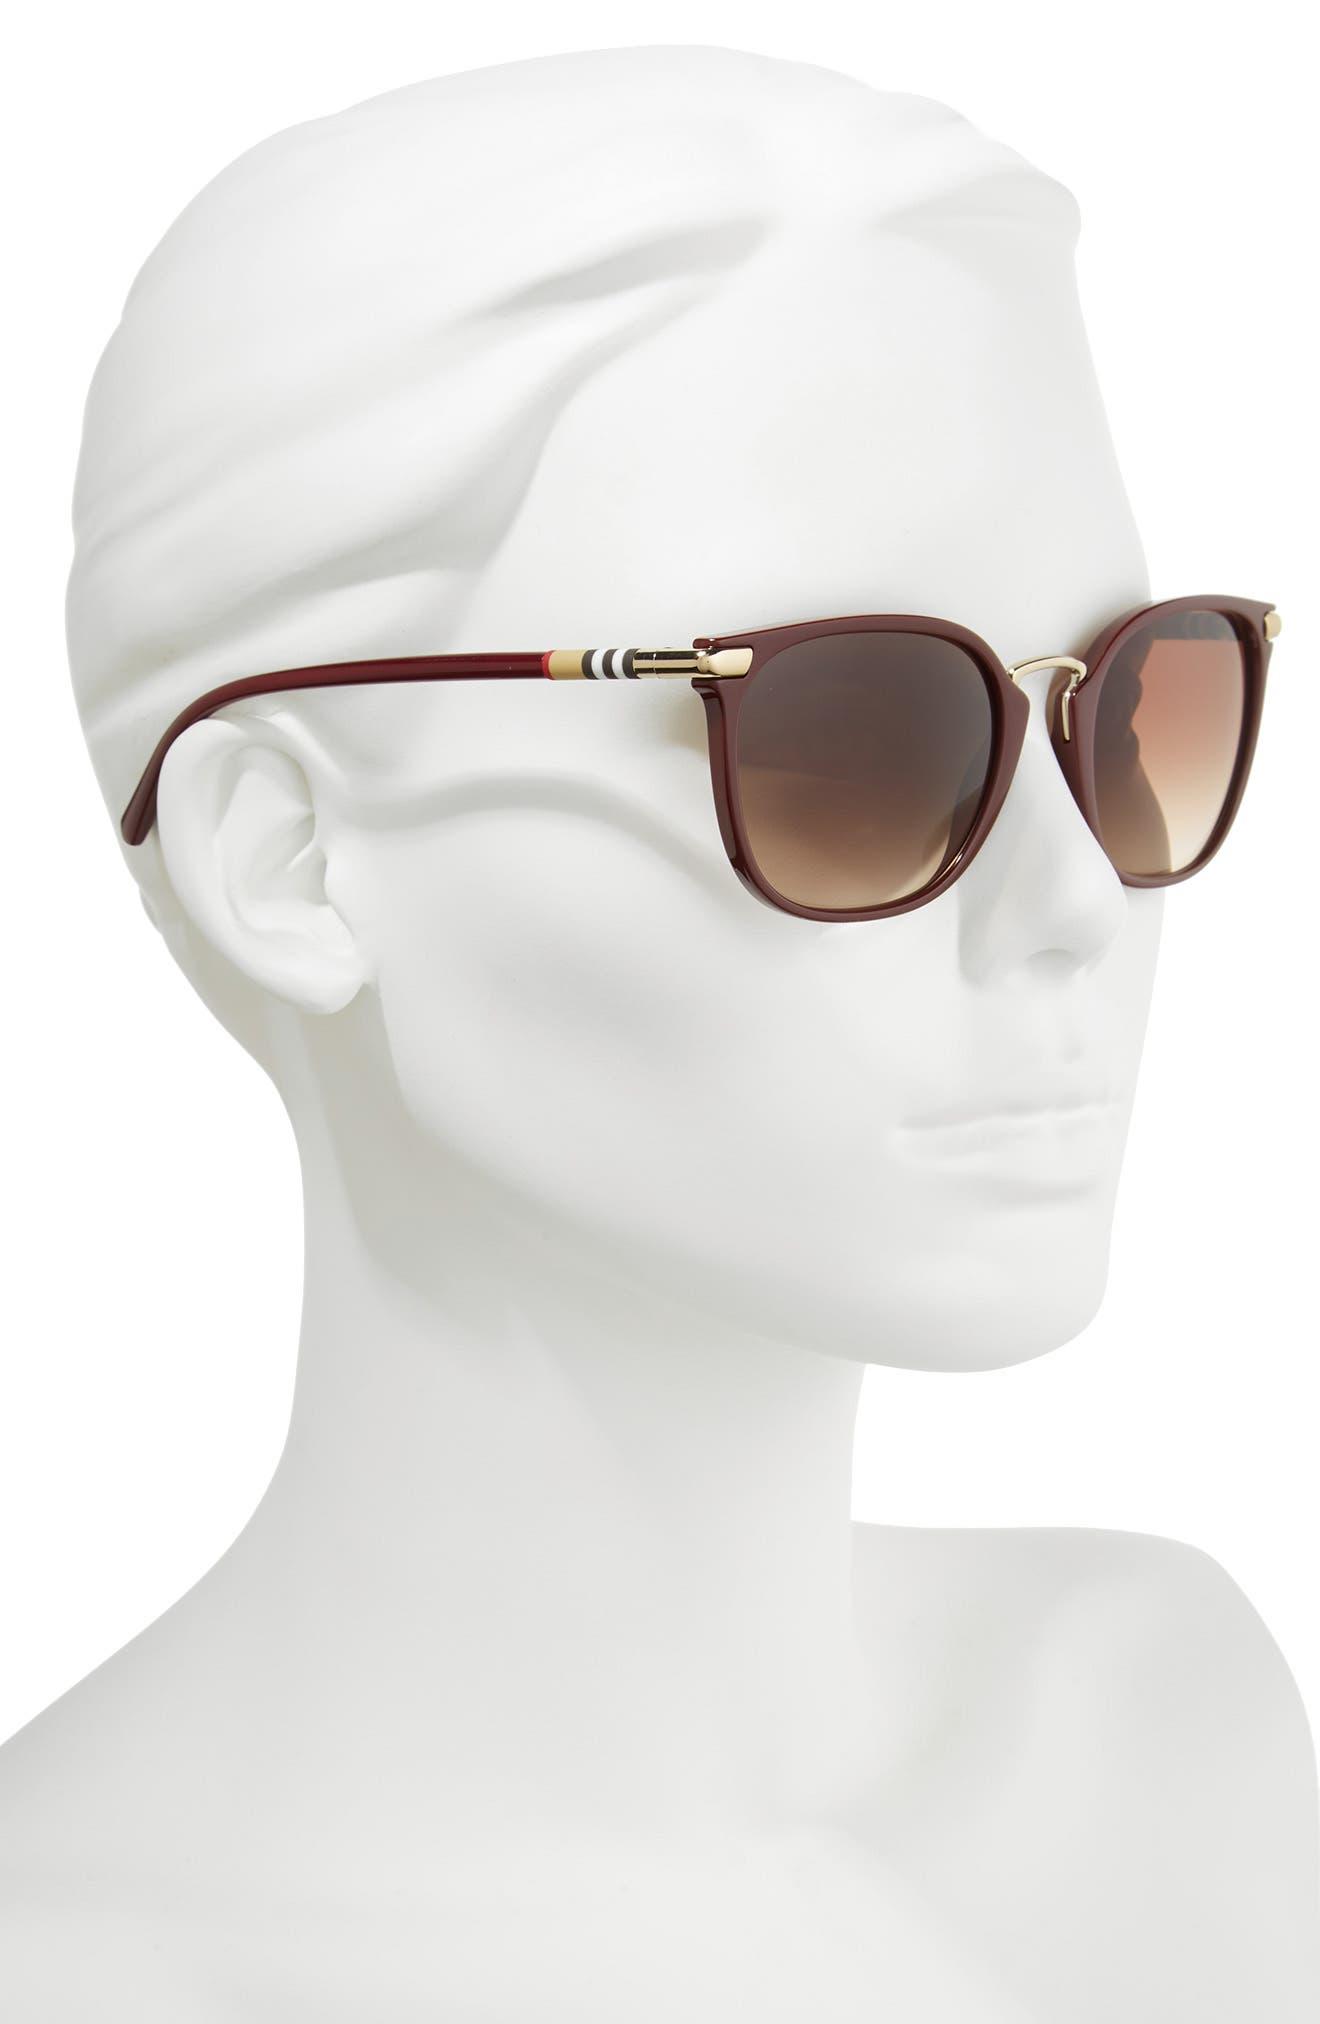 53mm Gradient Square Sunglasses,                             Alternate thumbnail 9, color,